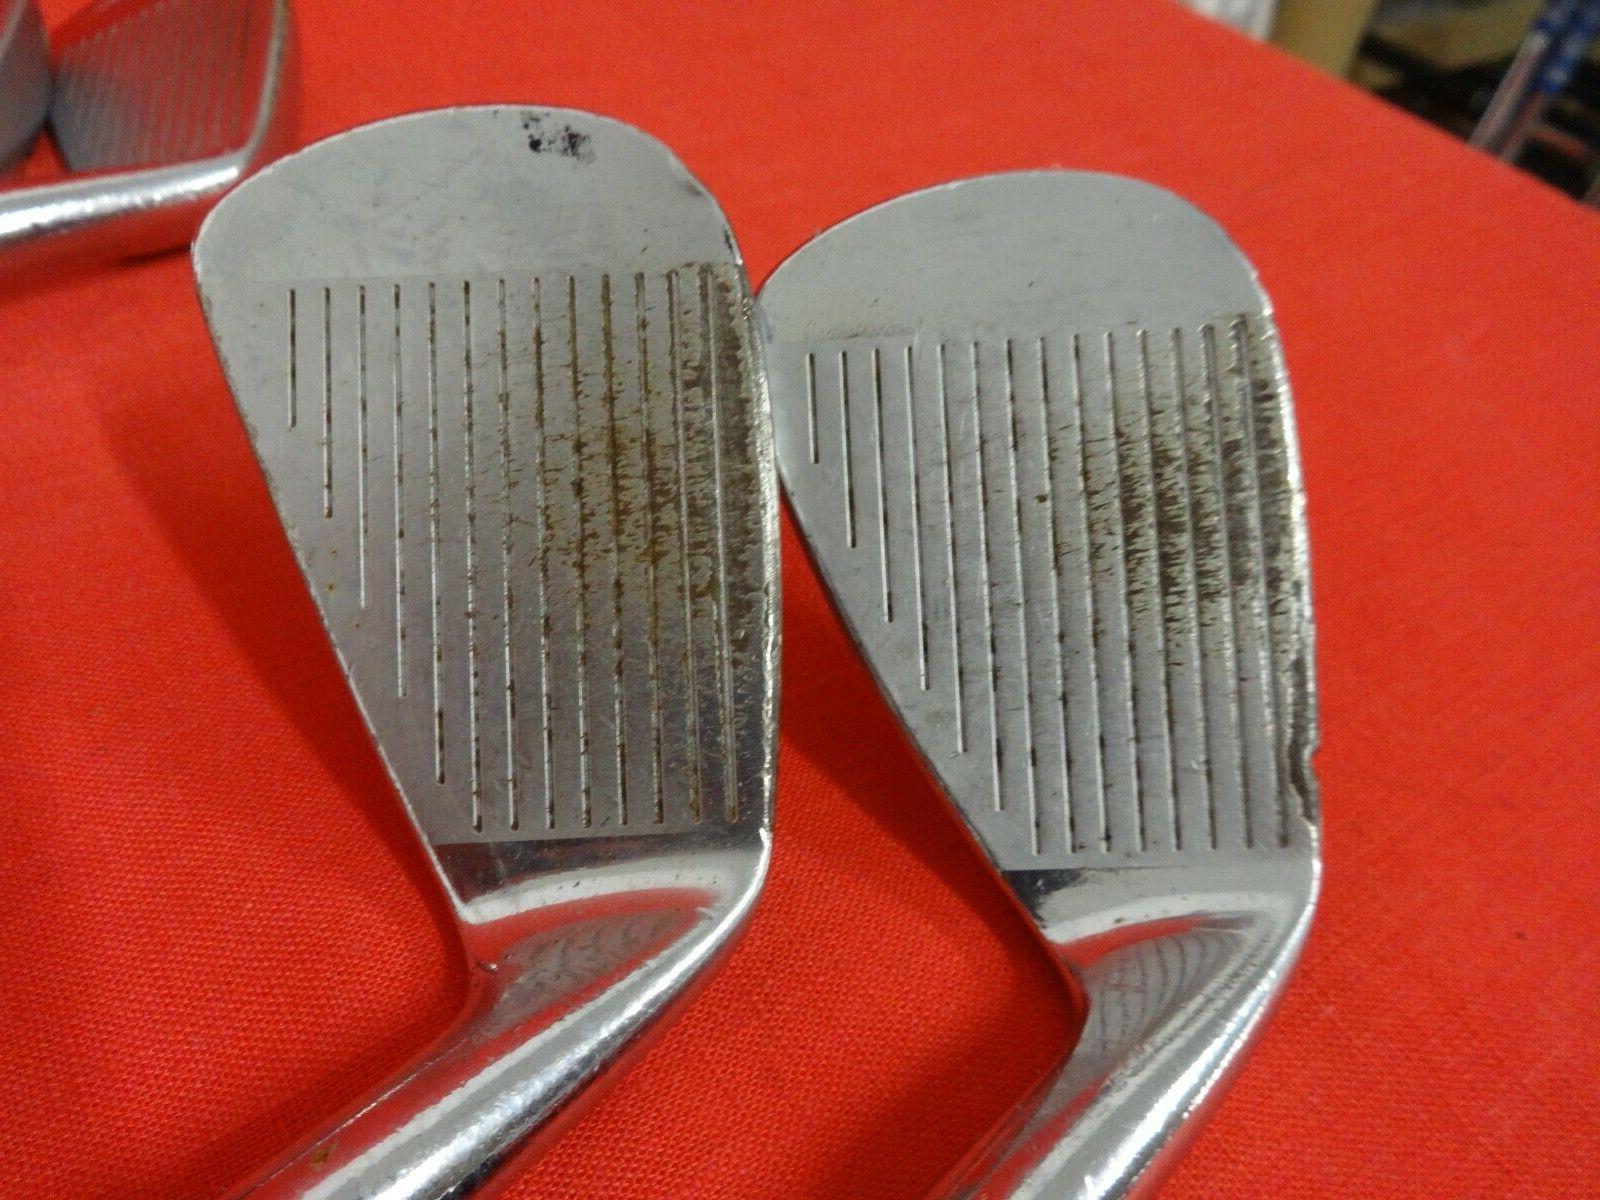 NIKE Pro 3-9 Iron Set RH Steel